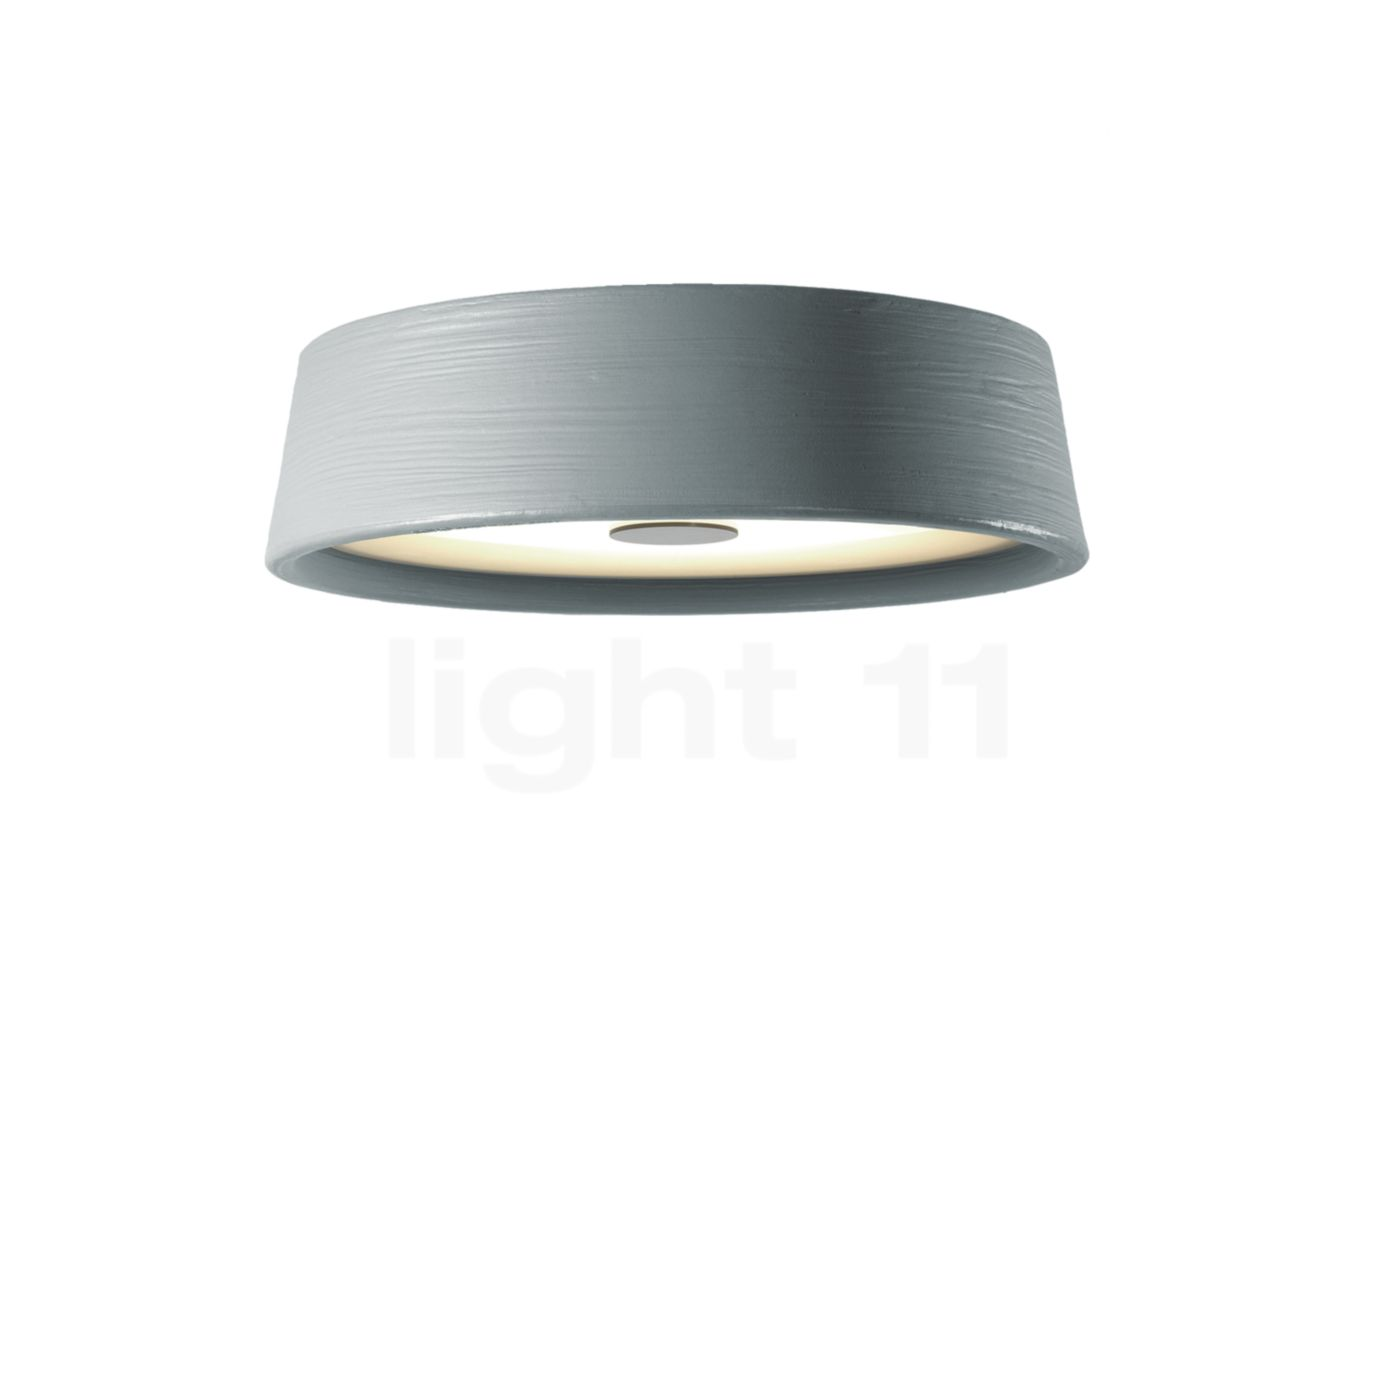 Marset Soho 38 Deckenleuchte LED, himmelblau A631-214